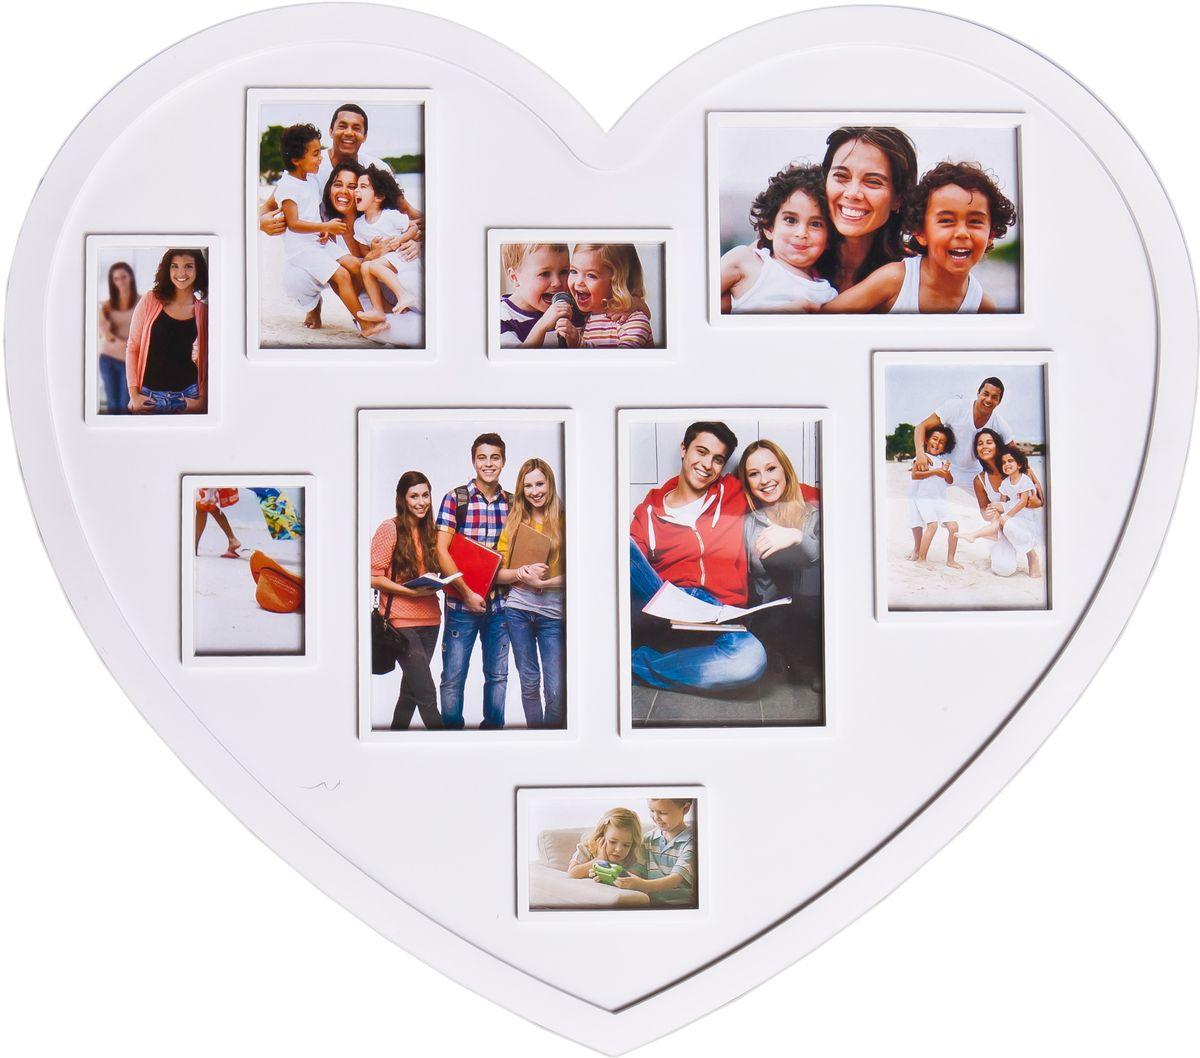 Фоторамка-коллаж Platinum, цвет: белый, 9 фоторамок. BH-2301-W фоторамка коллаж moretto на 8 фото 238003